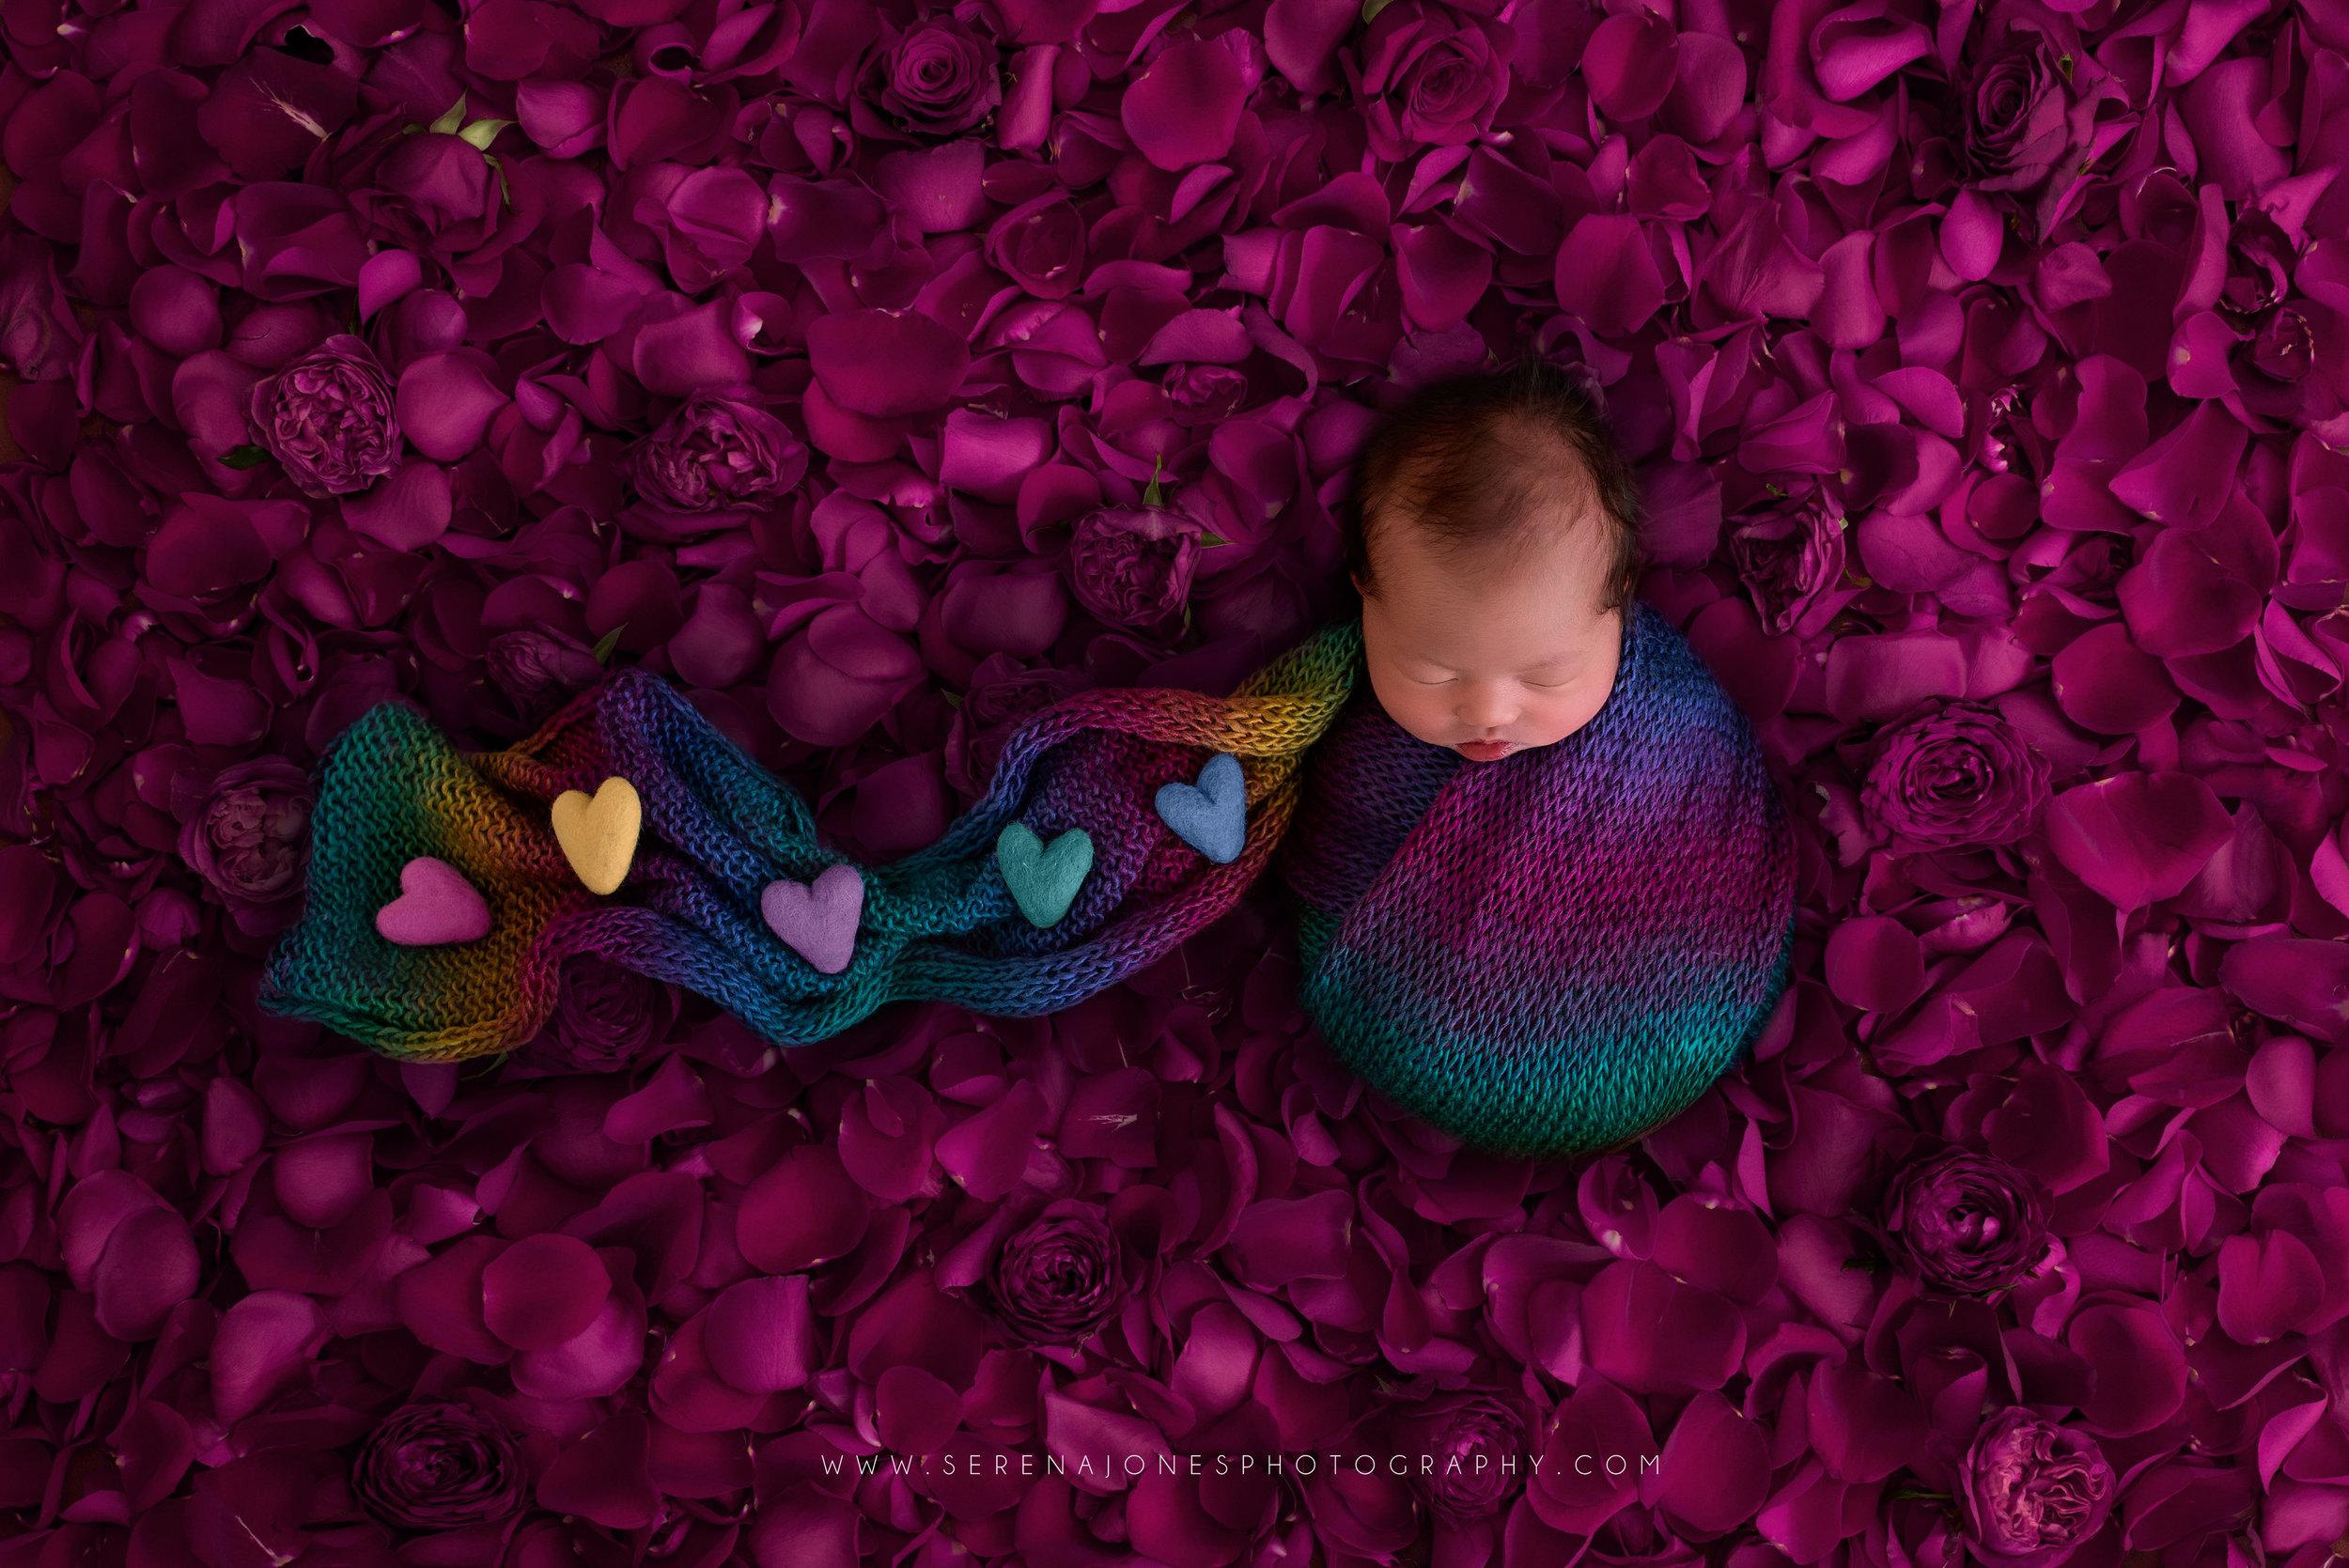 Serena Jones Photography - Sophia Gracielle Irawan - 21 FB.jpg